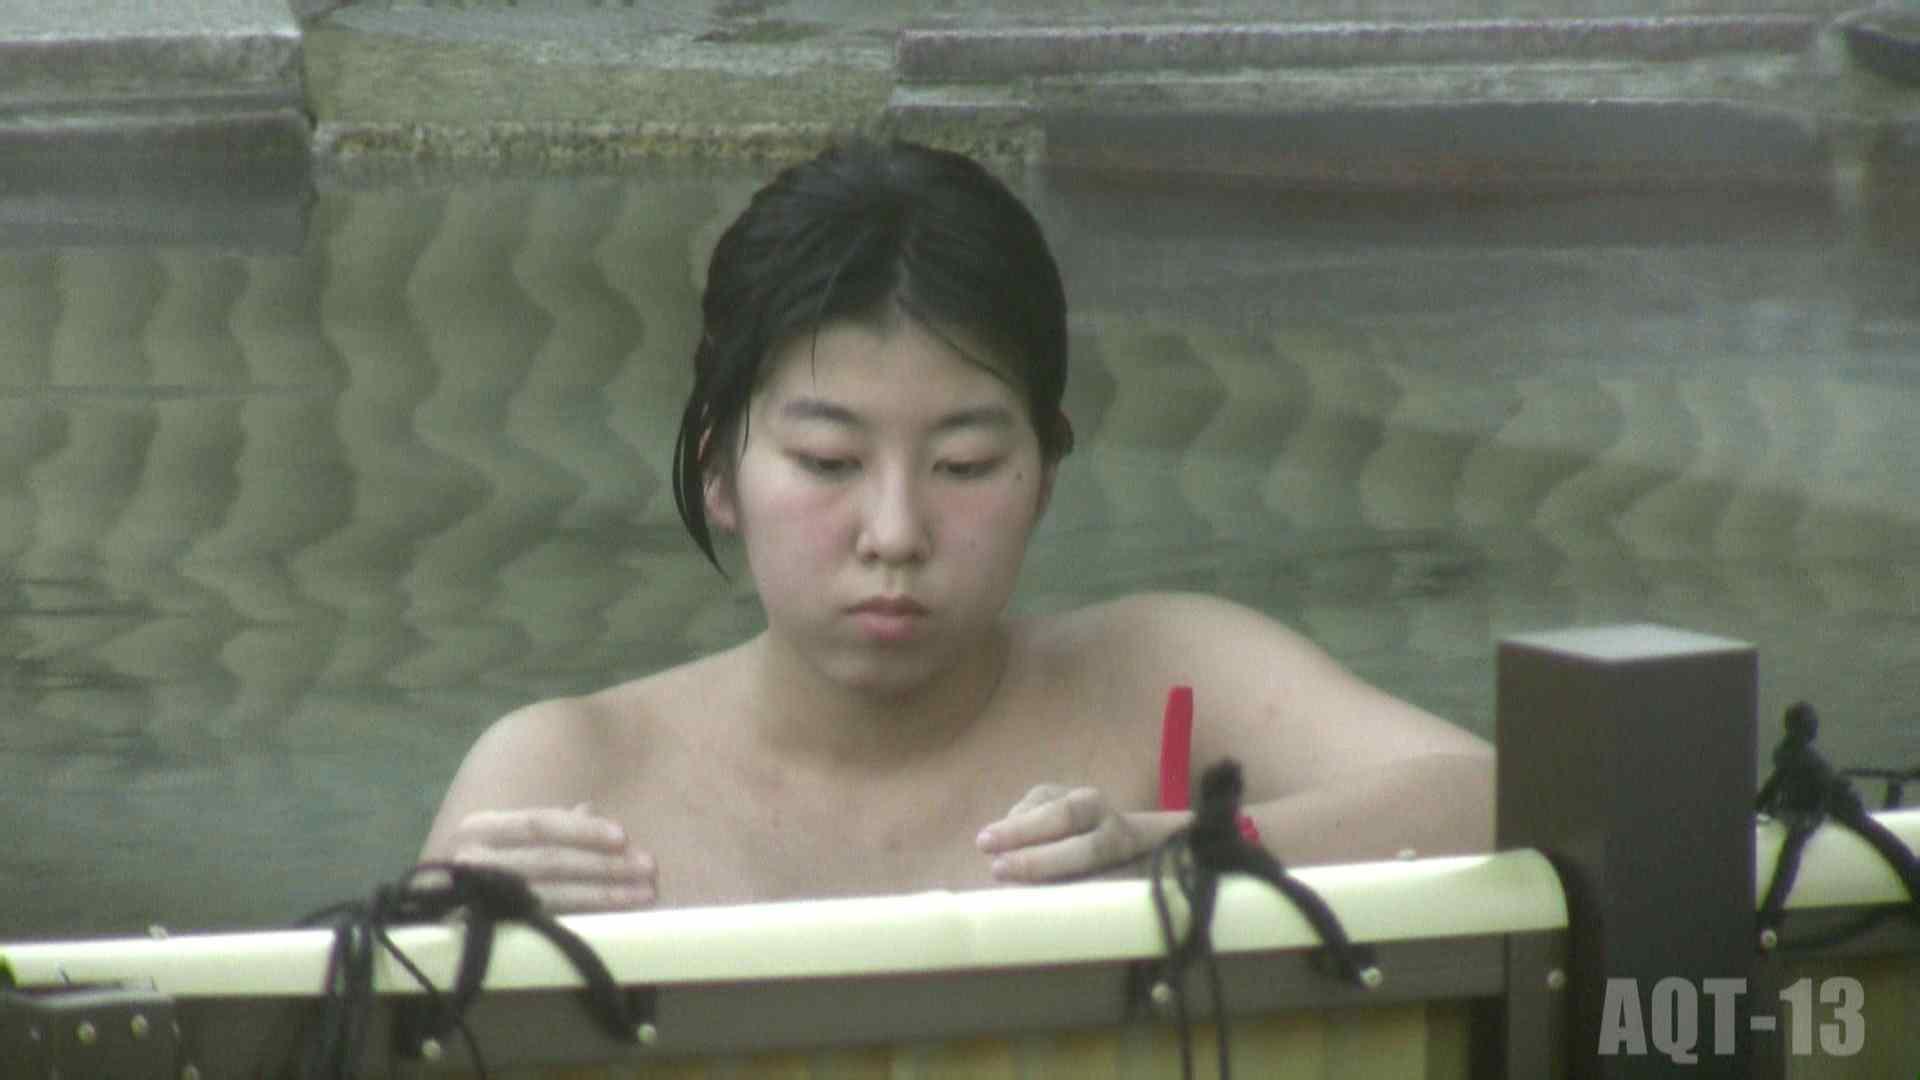 Aquaな露天風呂Vol.816 盗撮 盗み撮り動画キャプチャ 90連発 68